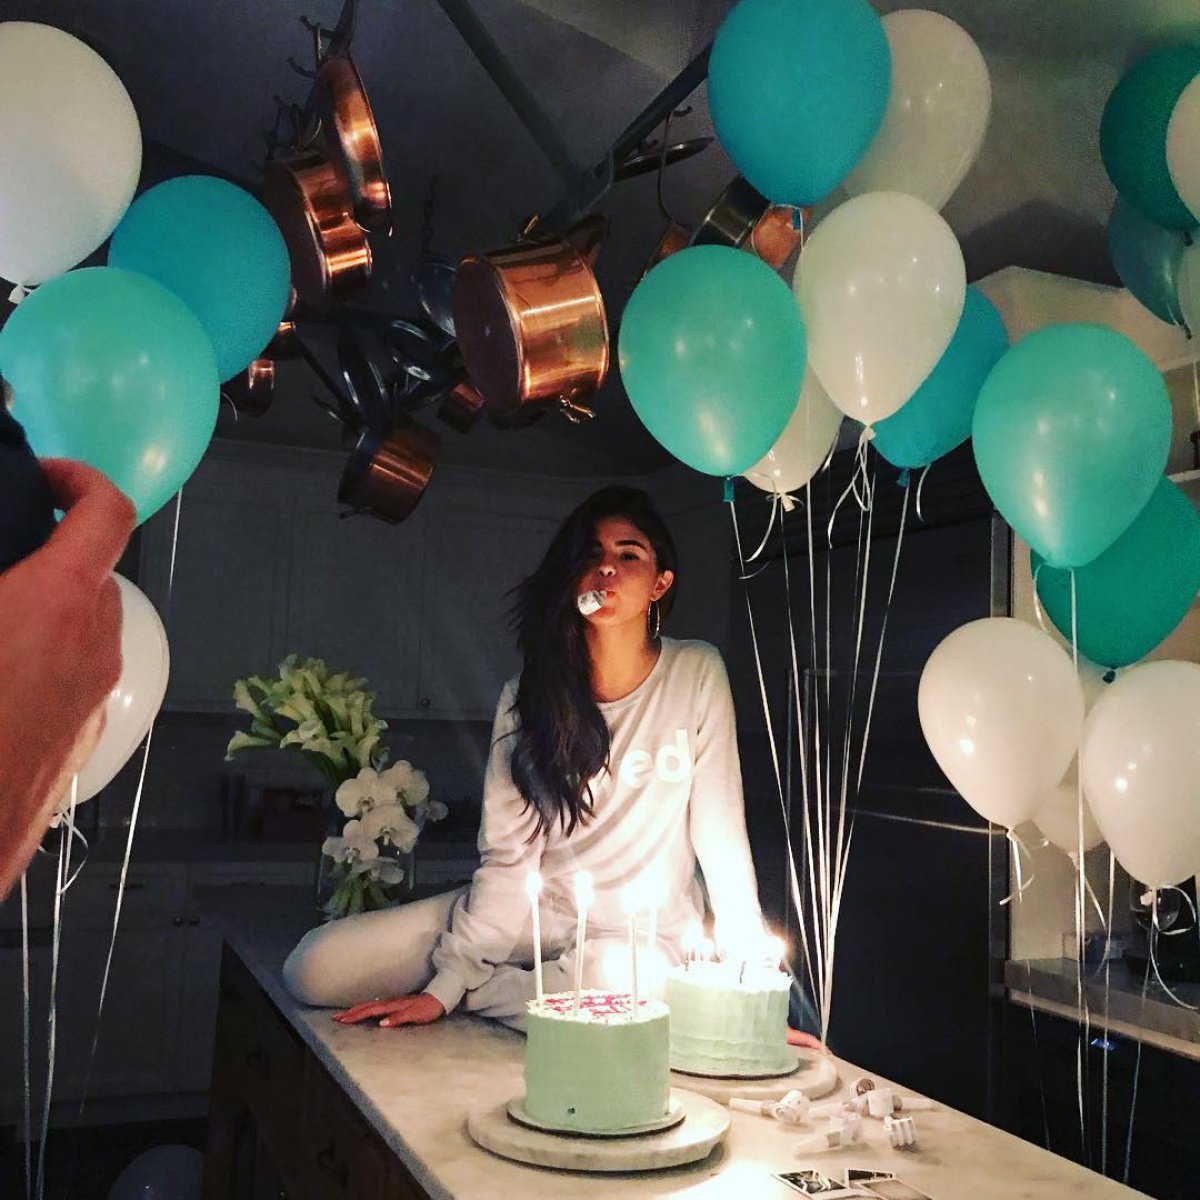 Selena Gomez celebrates her 25th birthday with The Weeknd - Reality